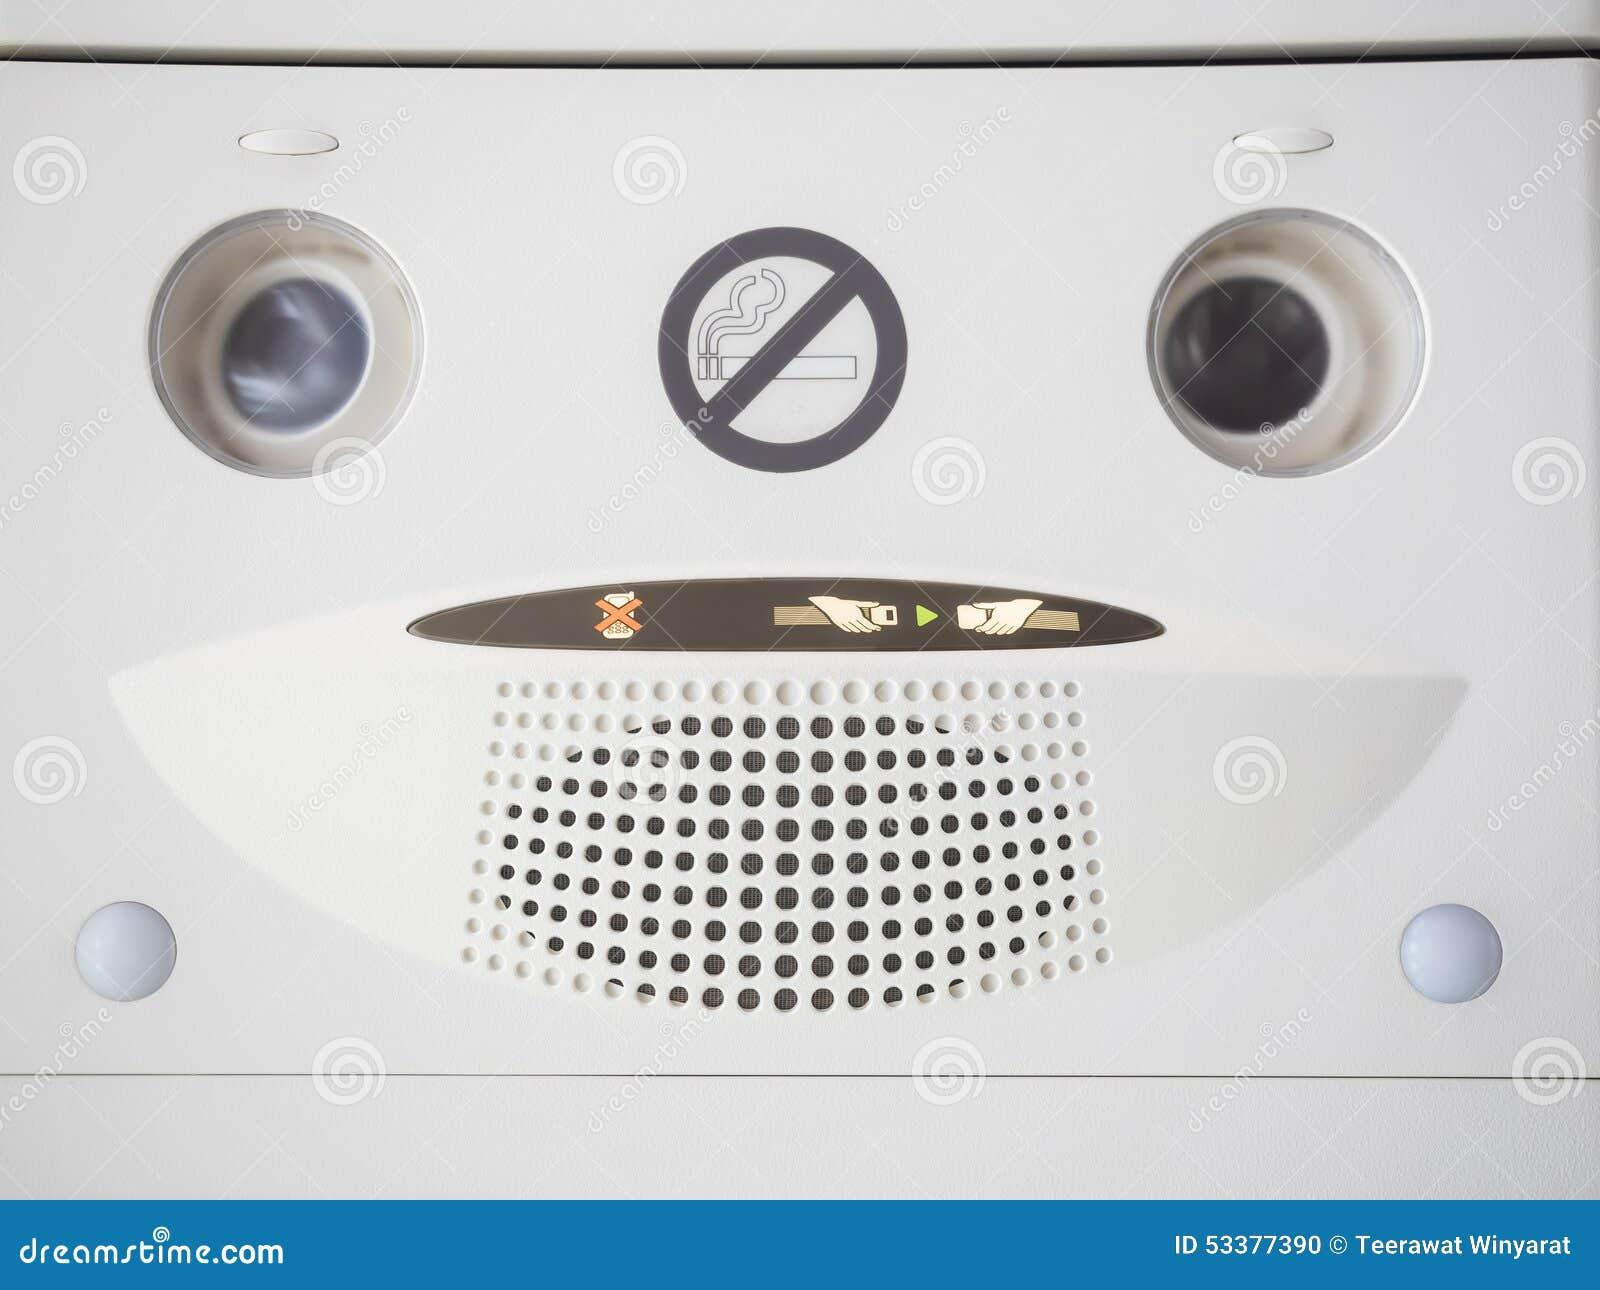 Airplane Interior No Smoking Sign And Safety Symbol Stock Photo